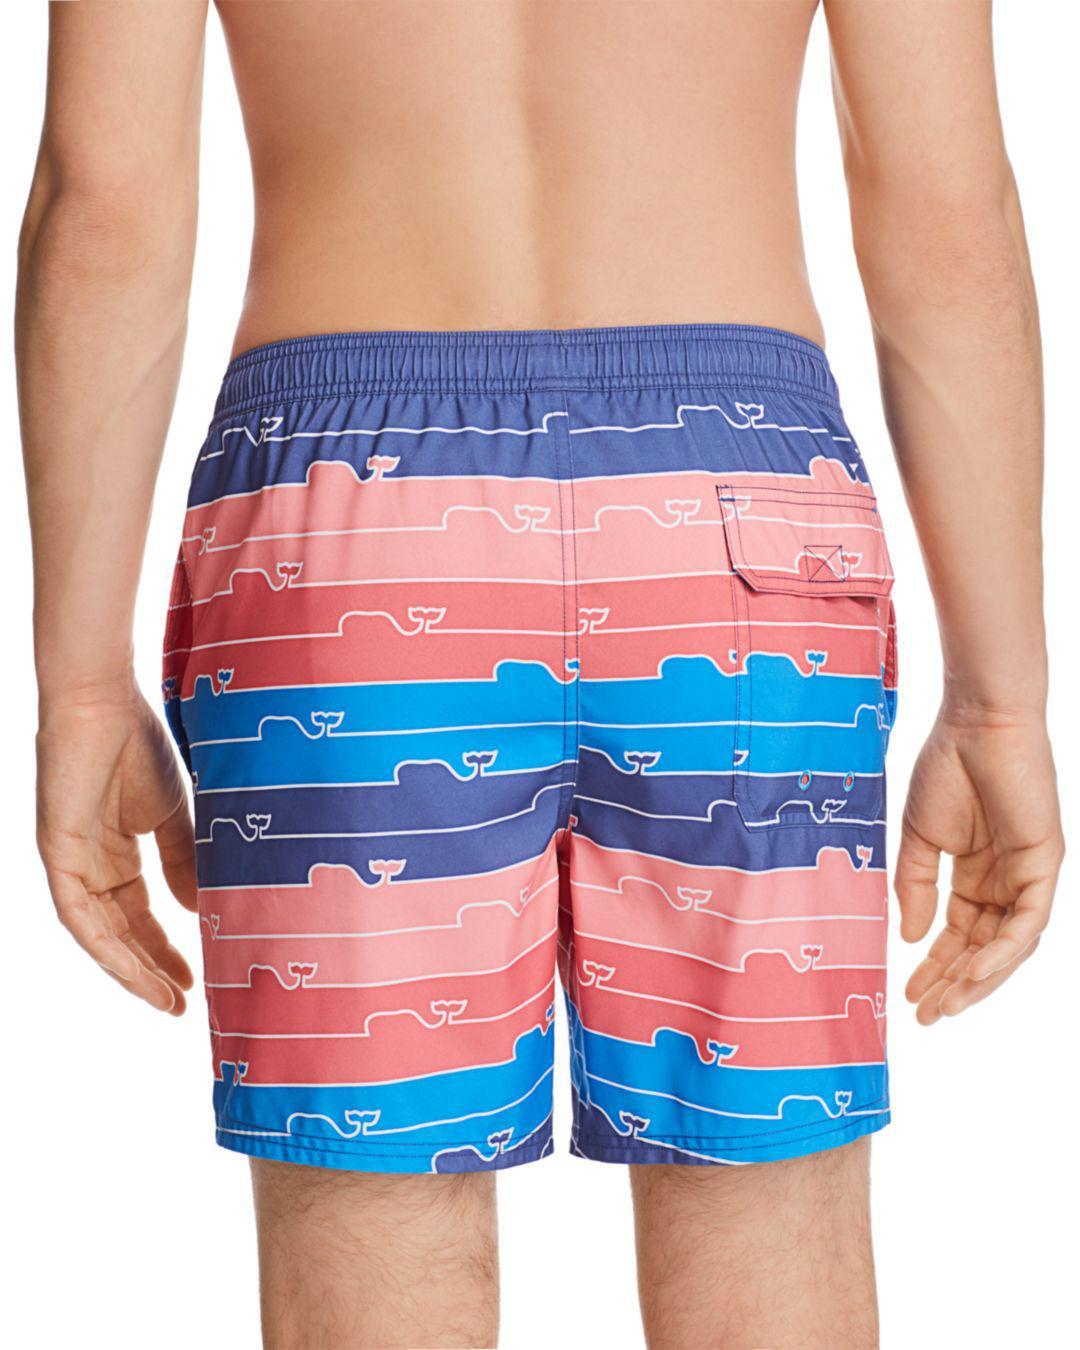 51d262dd53 Lyst - Vineyard Vines Whale Line Chappy Swim Trunks in Blue for Men